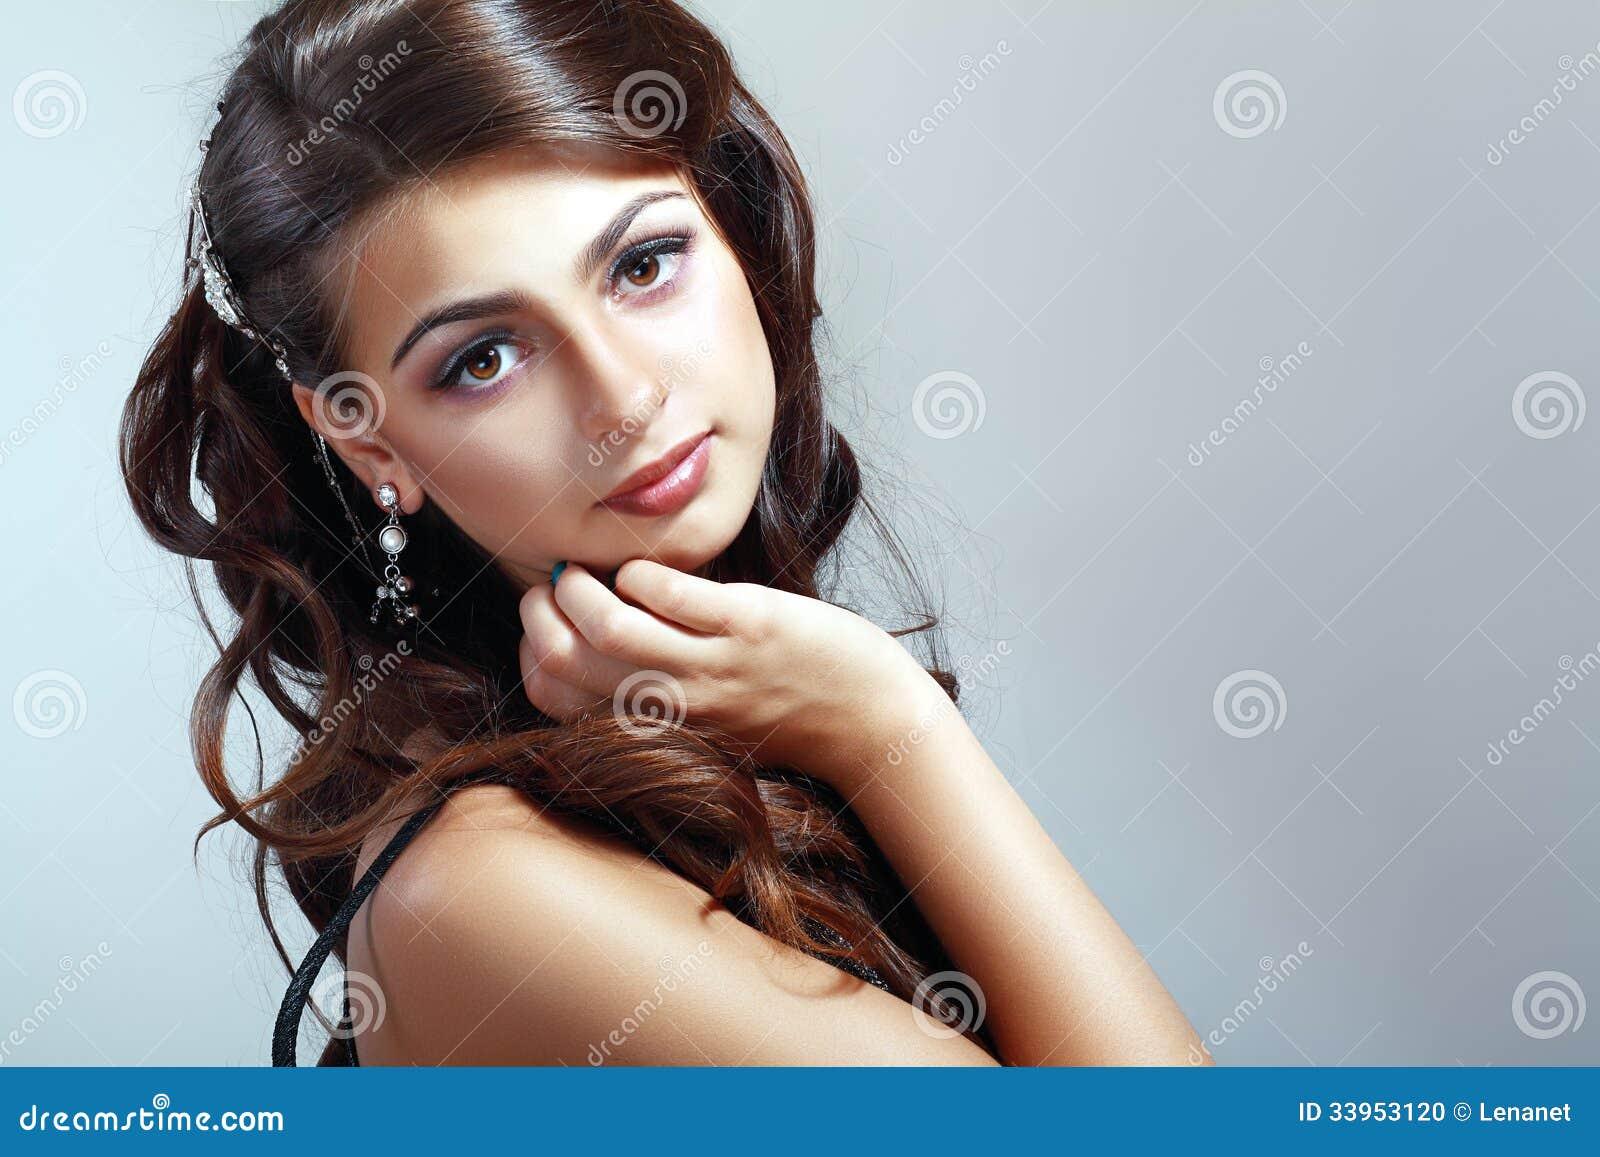 Fashion Beauty Hair: Teen Model Girl Stock Photo